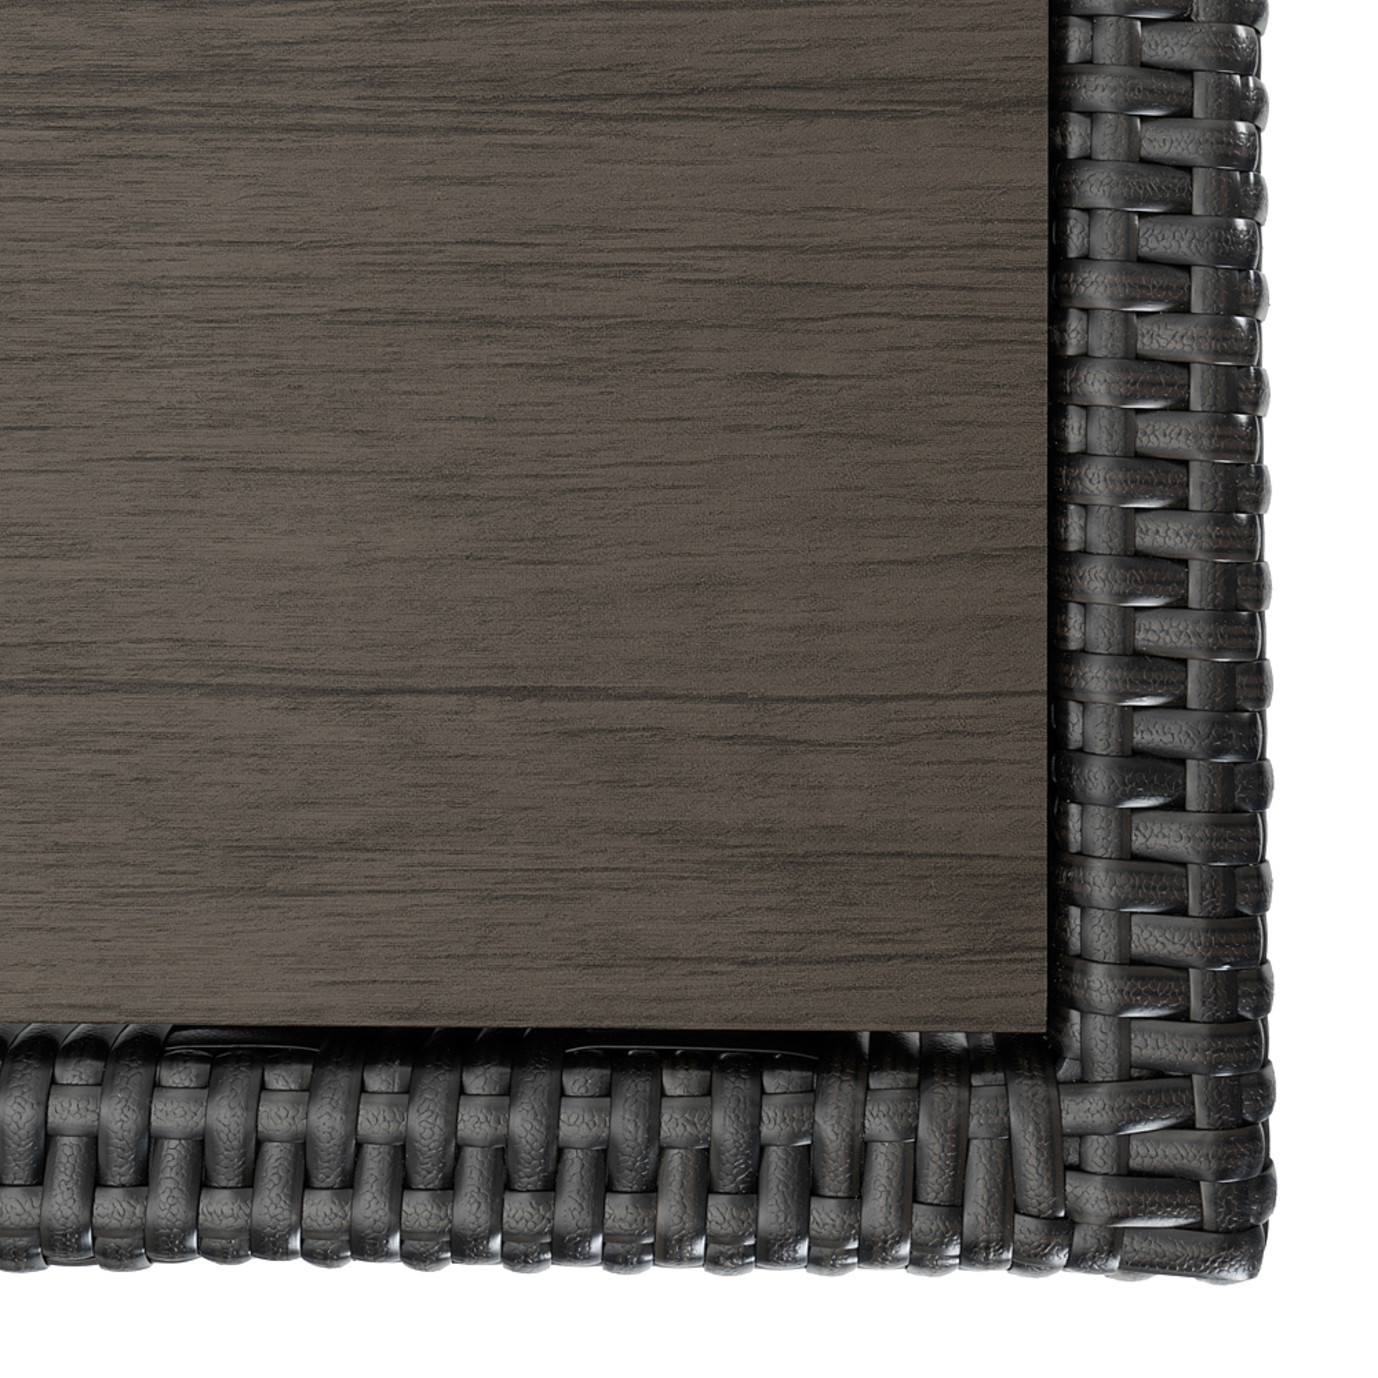 Portofino® Comfort 9 Piece Wood Dining Set - Taupe Mist